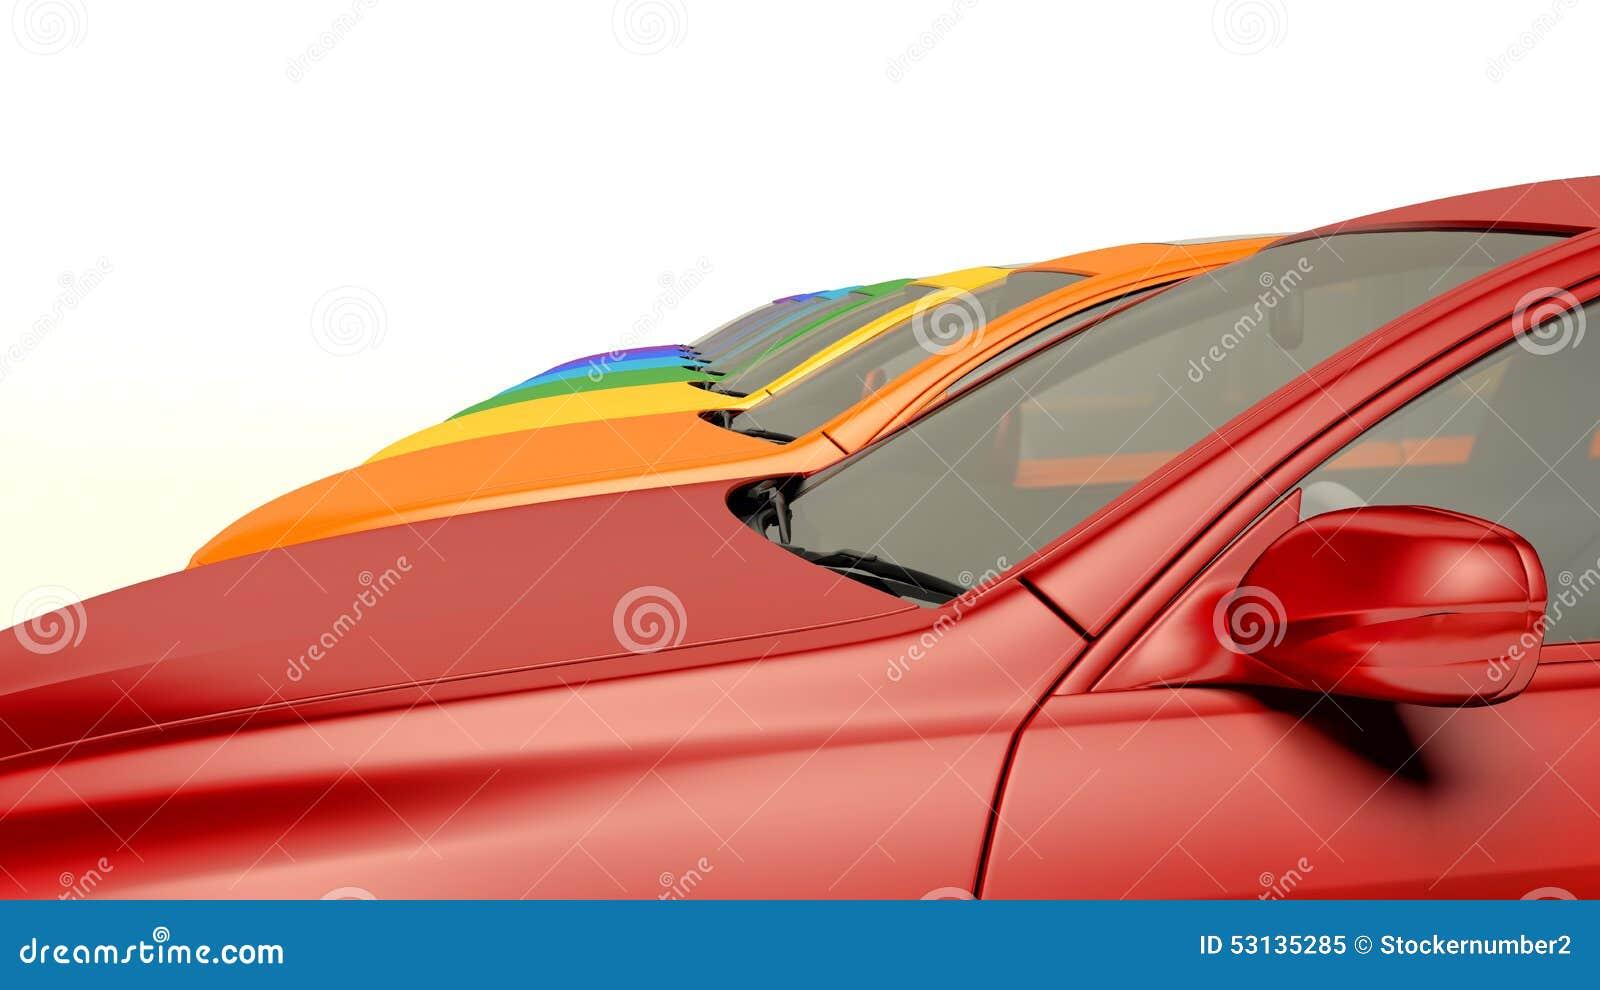 coches modernos en la accin coches a estrenar del de coches en fila stock de